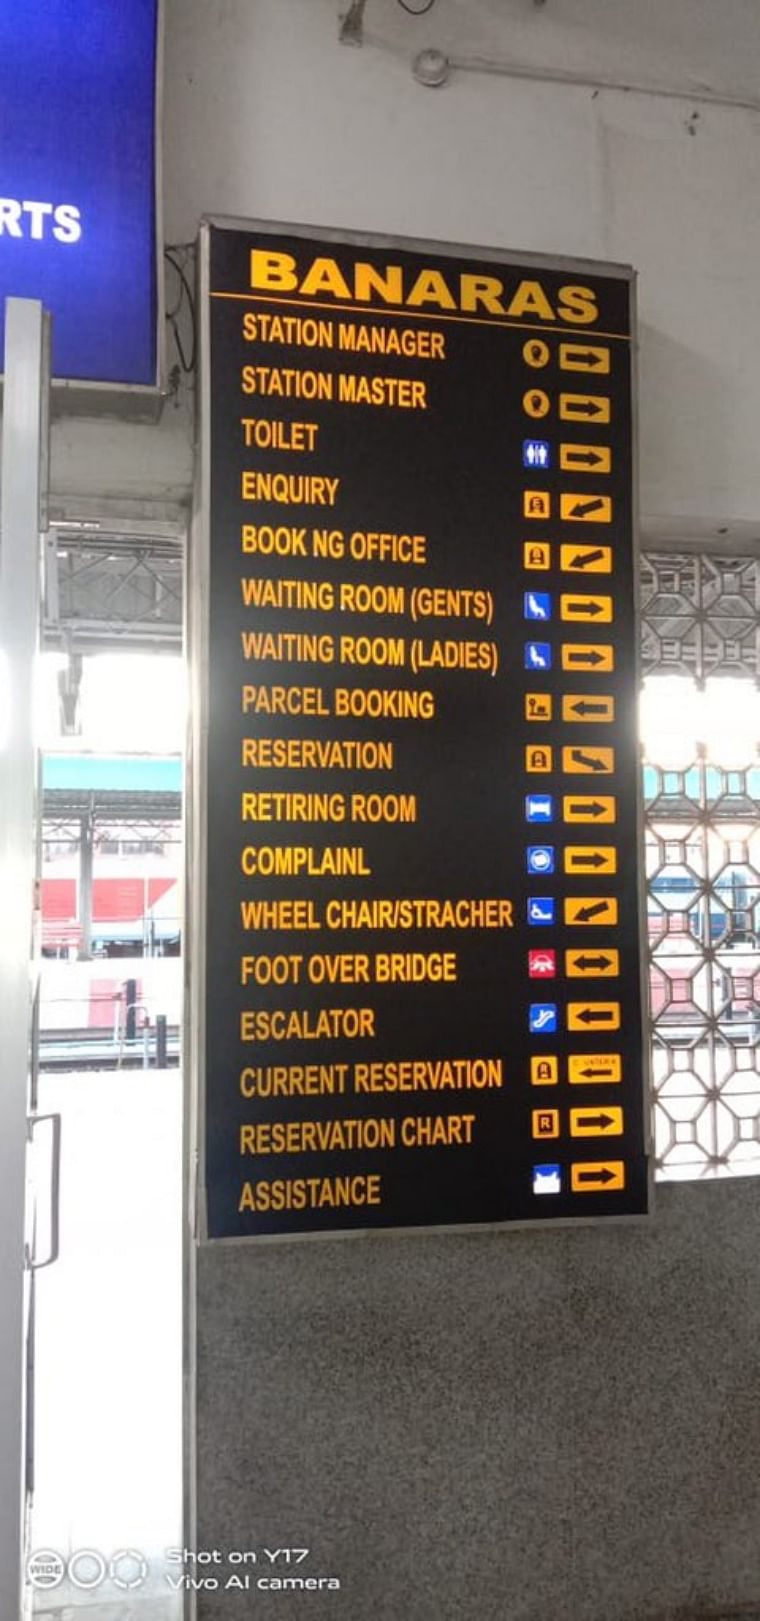 In pics: Varanasi gets its Banaras railway station after 64 years